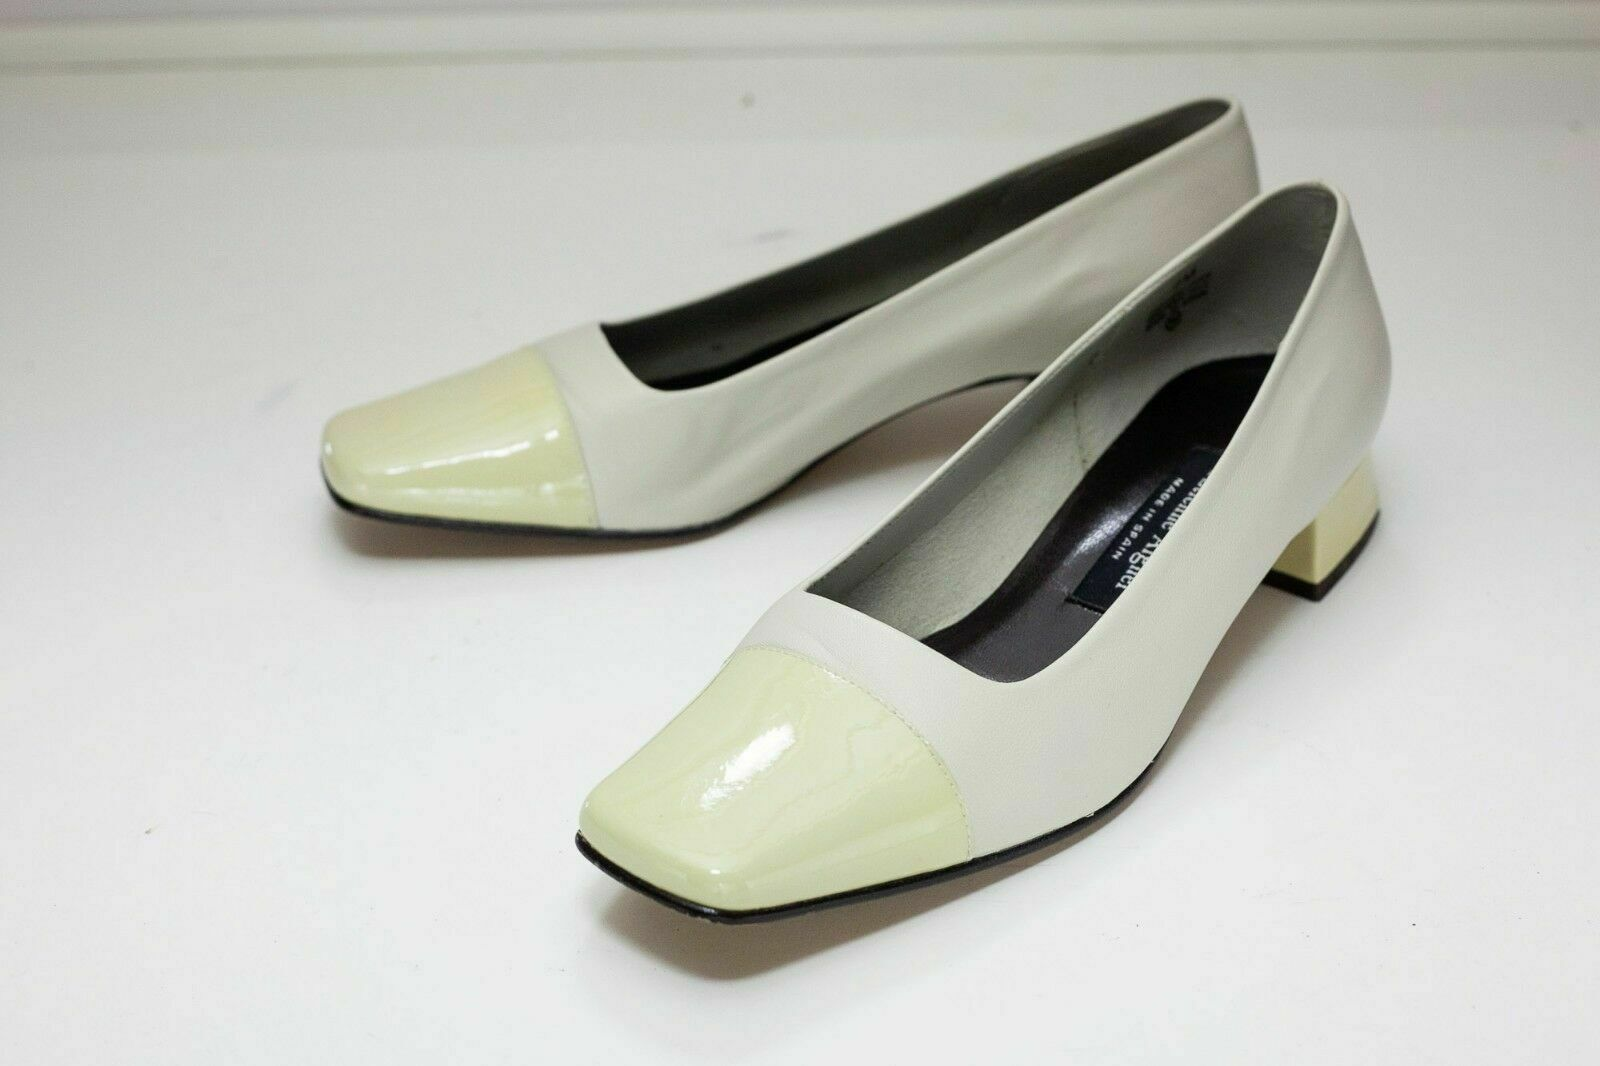 Etienne Aigner 7 Cream Yellow Women's Slip On Shoes Vintage Look - $46.00